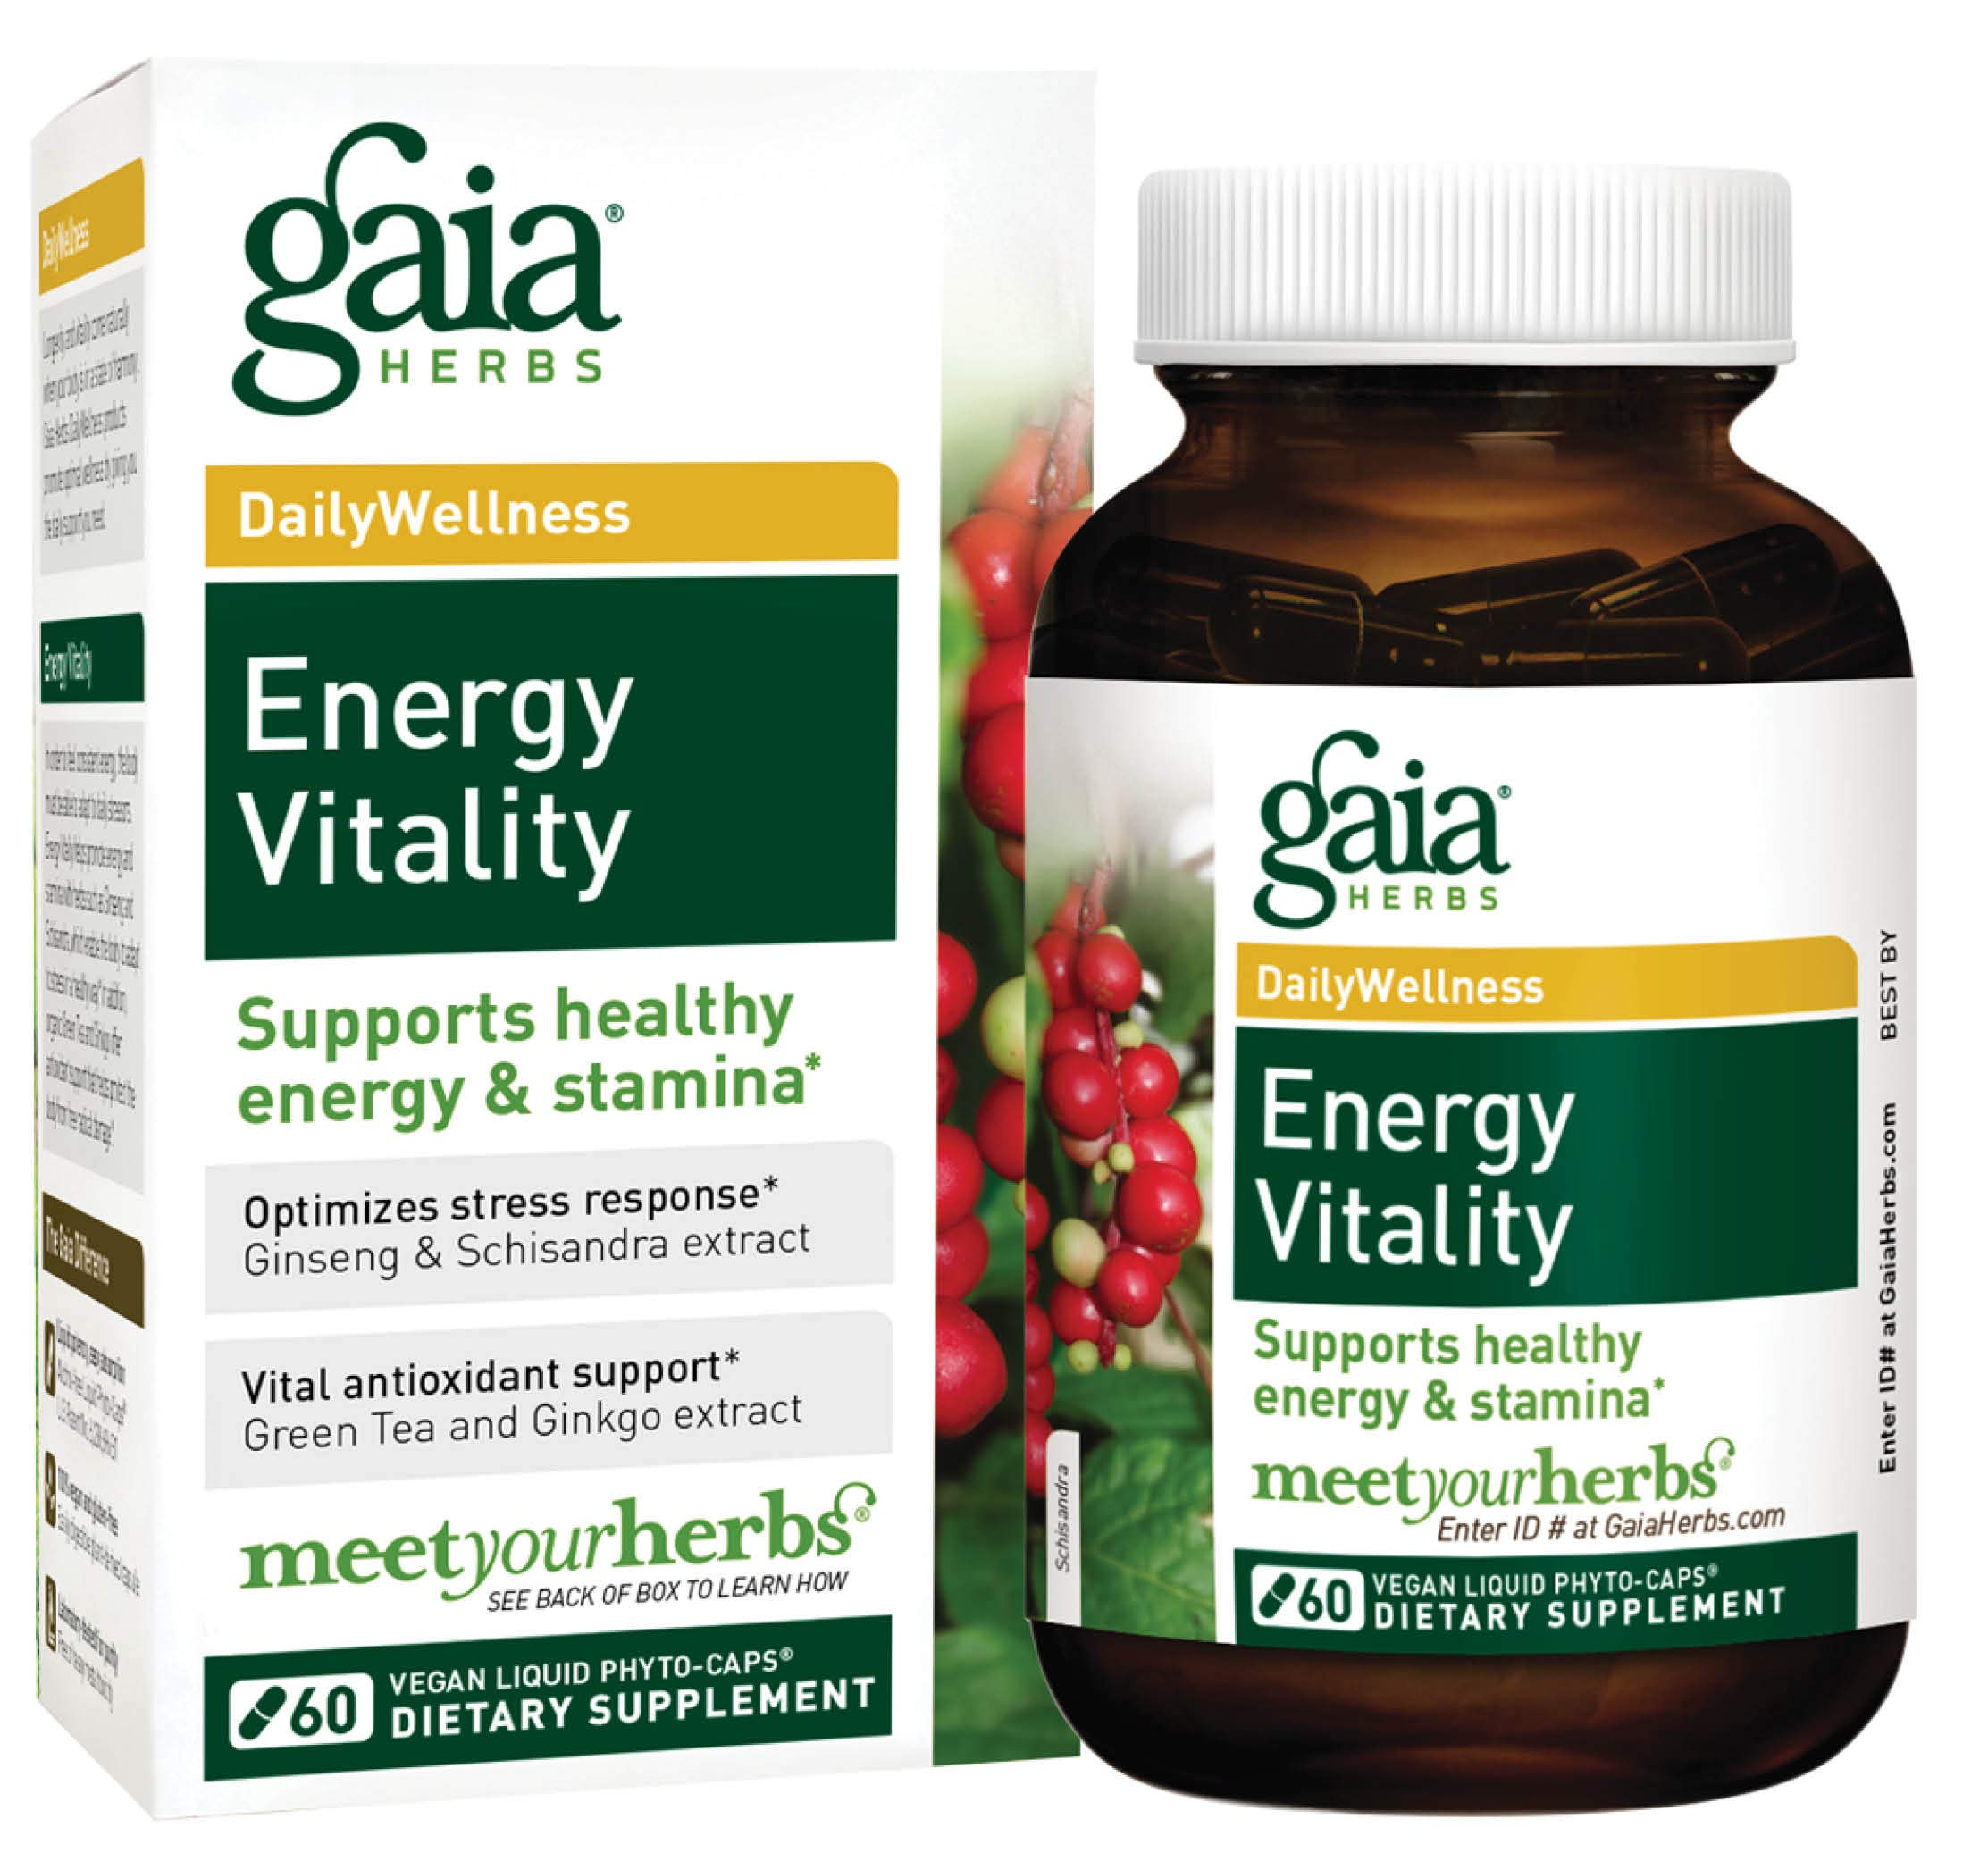 Gaia Herbs Energy Vitality, Vegan Liquid Capsules, 60 Count - Promotes Healthy Energy and Stamina, Healthy Stress Response, Green Tea Extract, Ginkgo Biloba, Panax Ginseng, Schisandra Berry